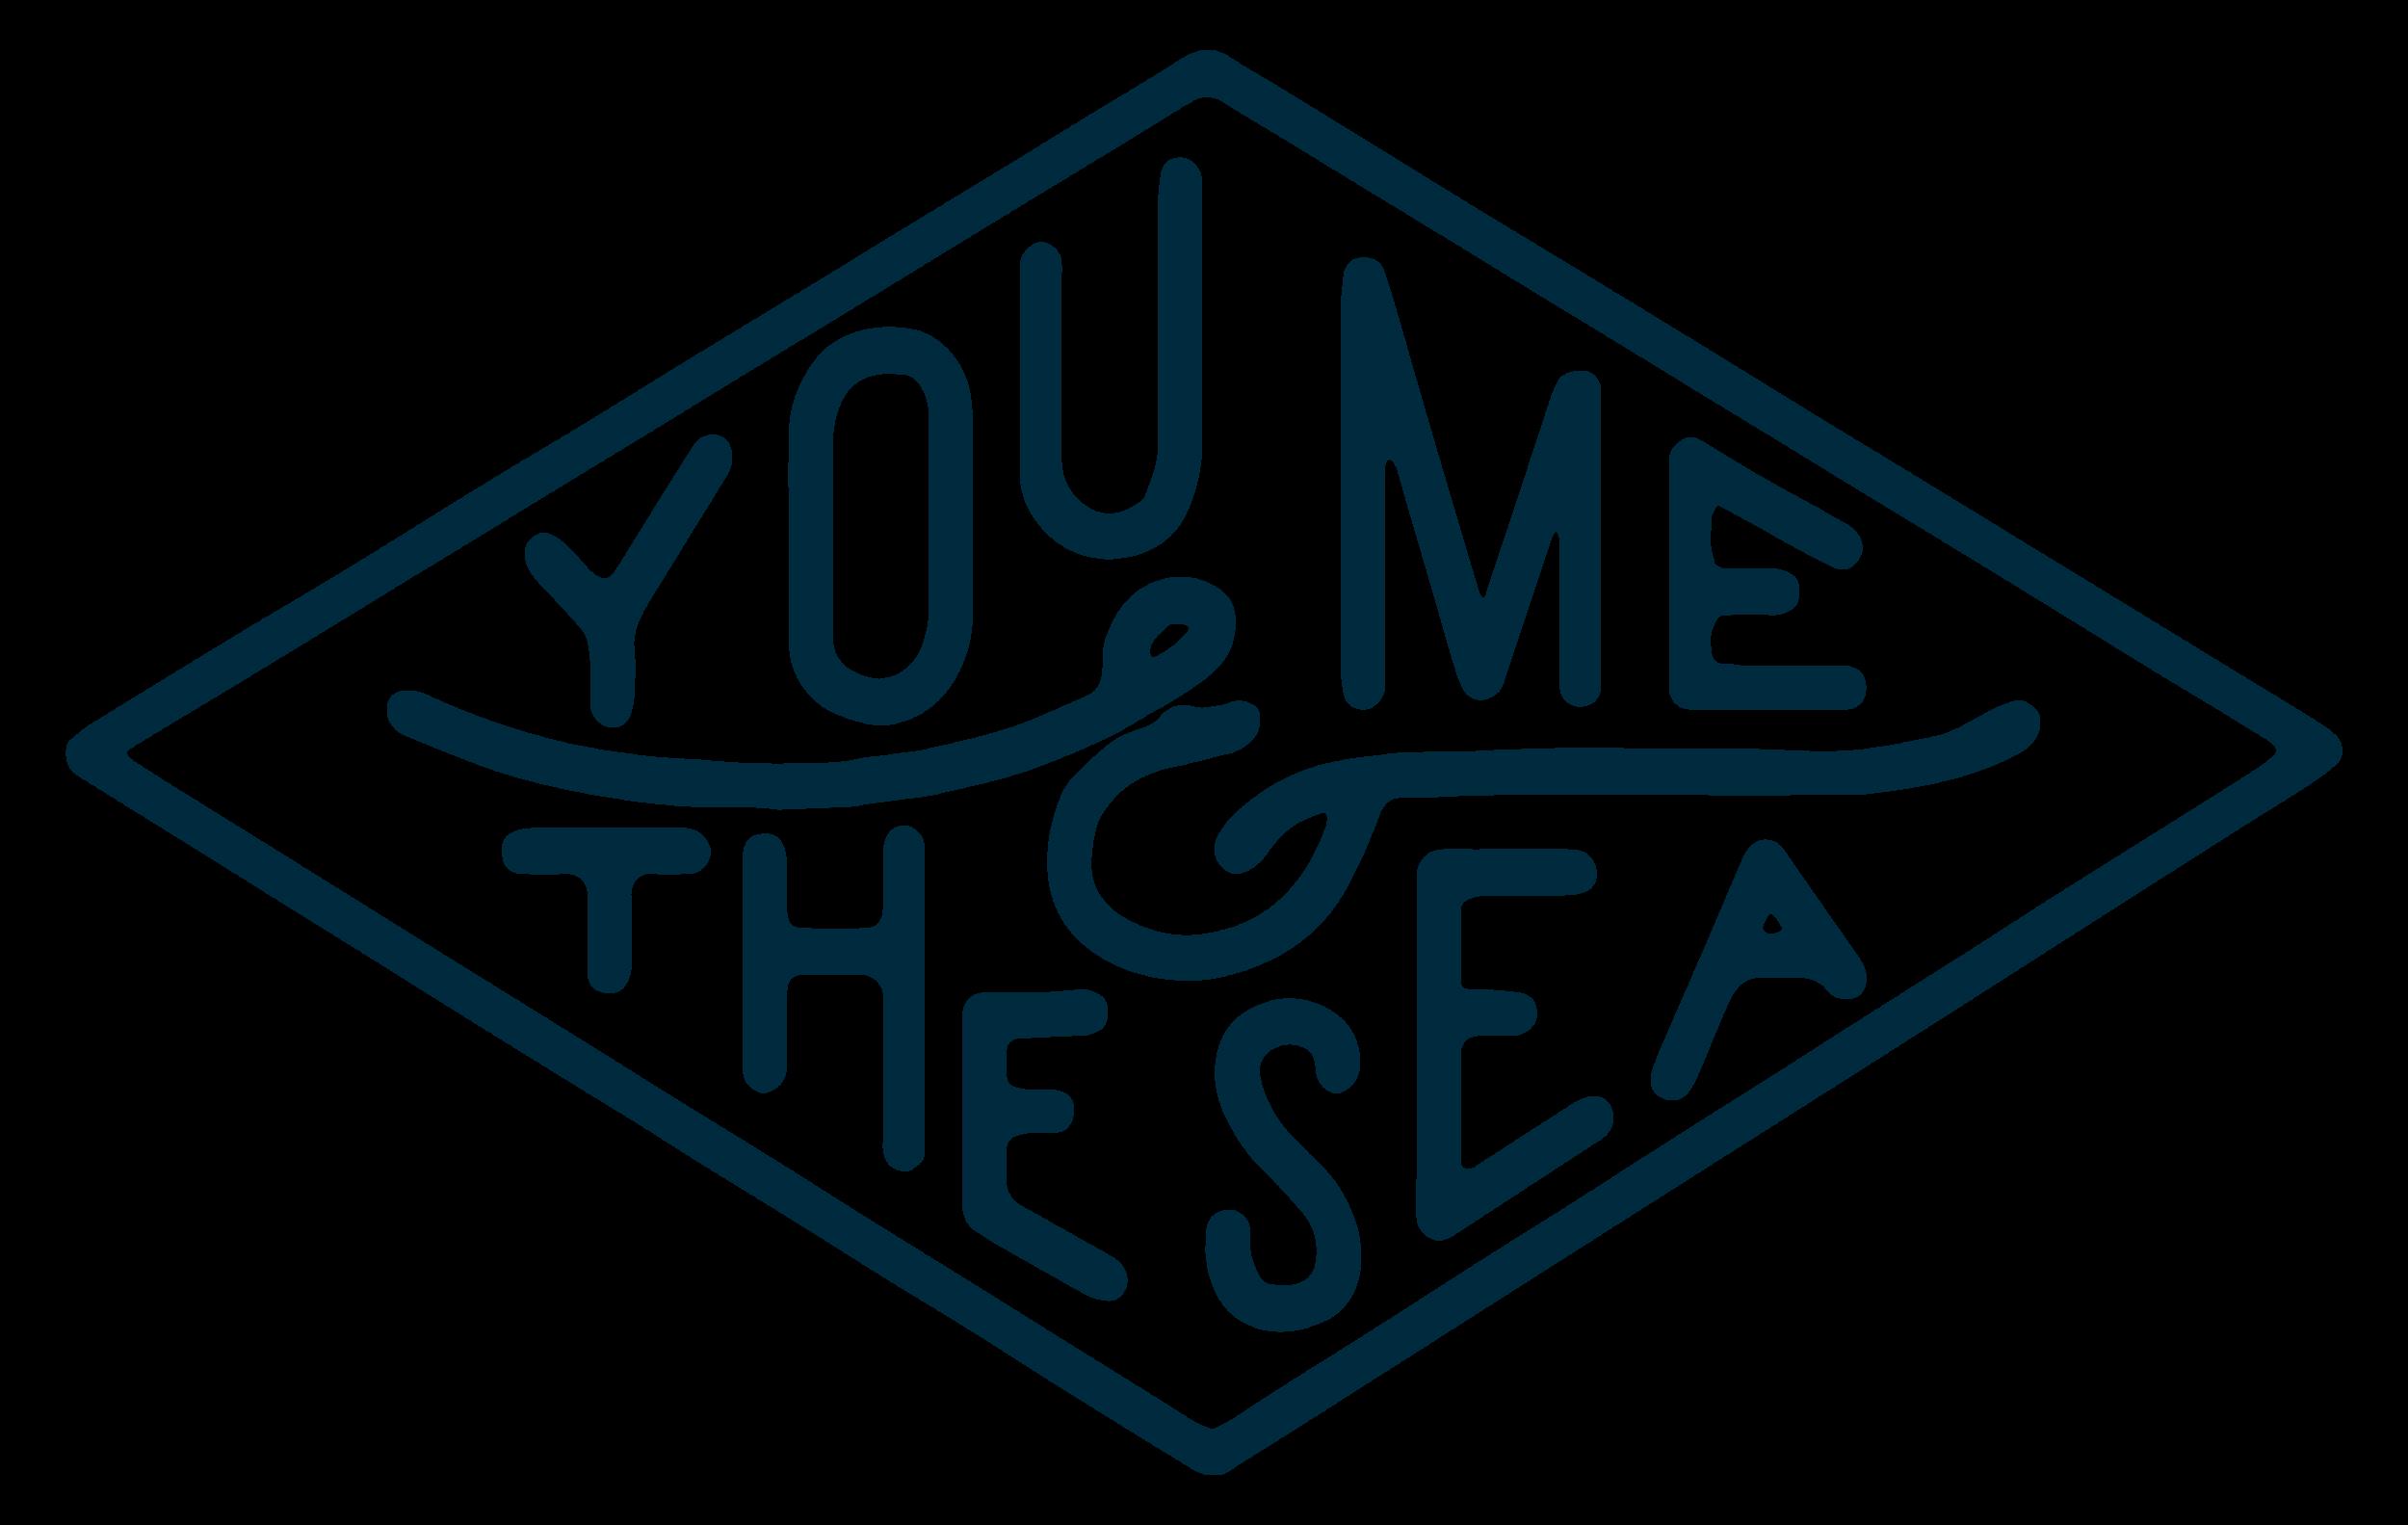 You Me & The Sea, Photographer, Perth, Western Australia